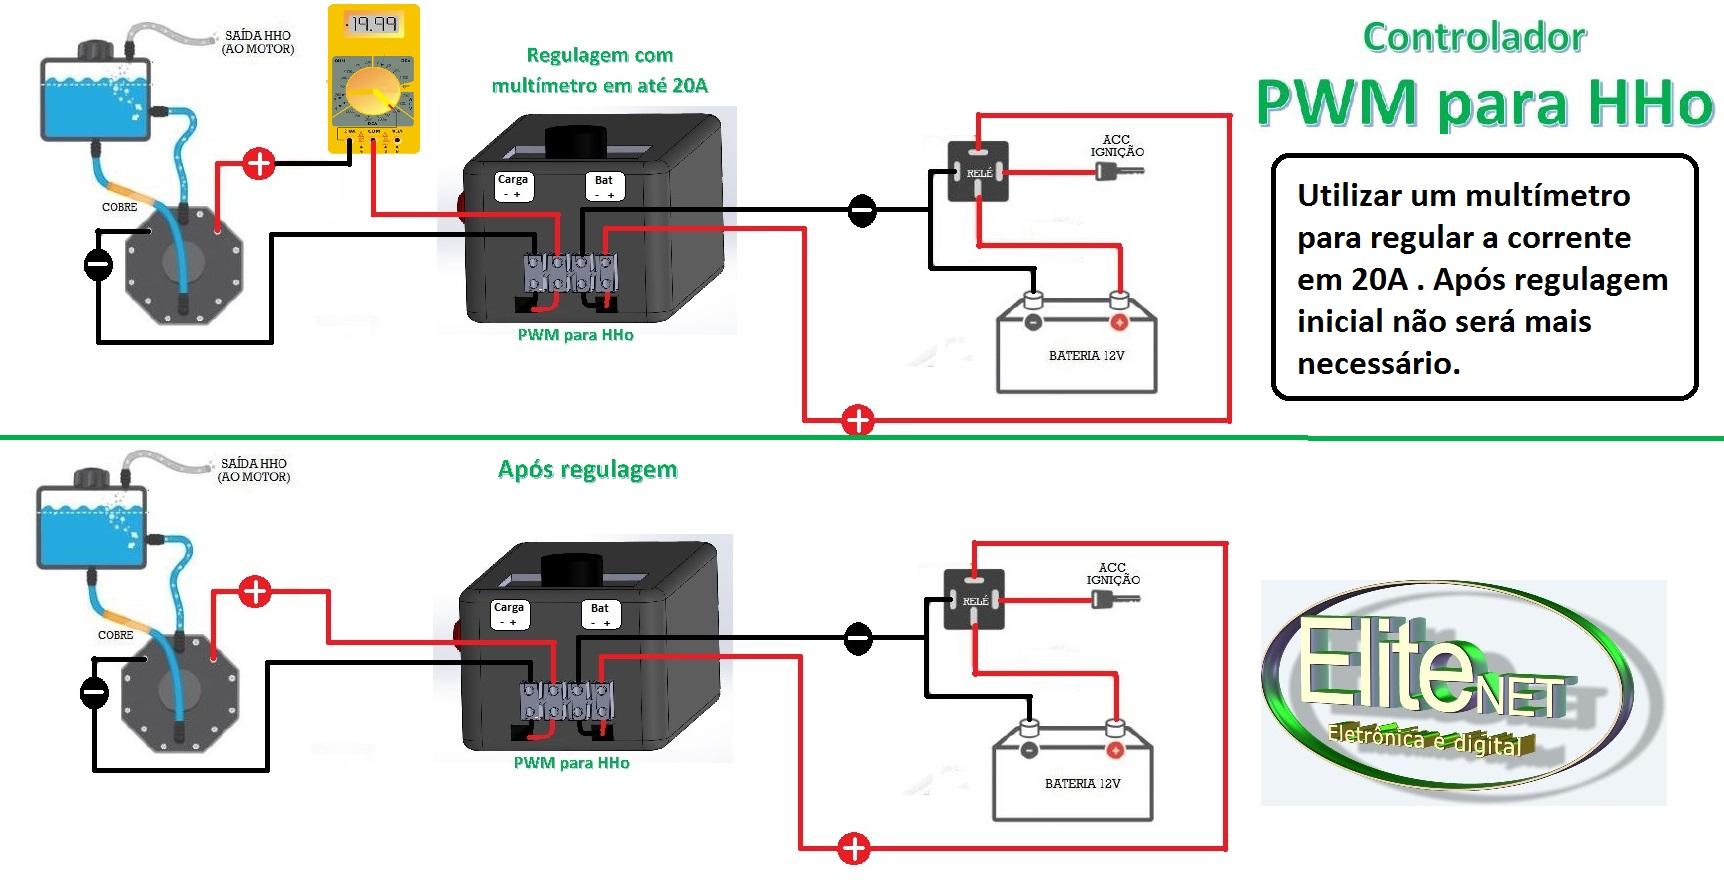 pwm wiring diagram for hho systems thermostat color circuito para kits célula de hidrogênio